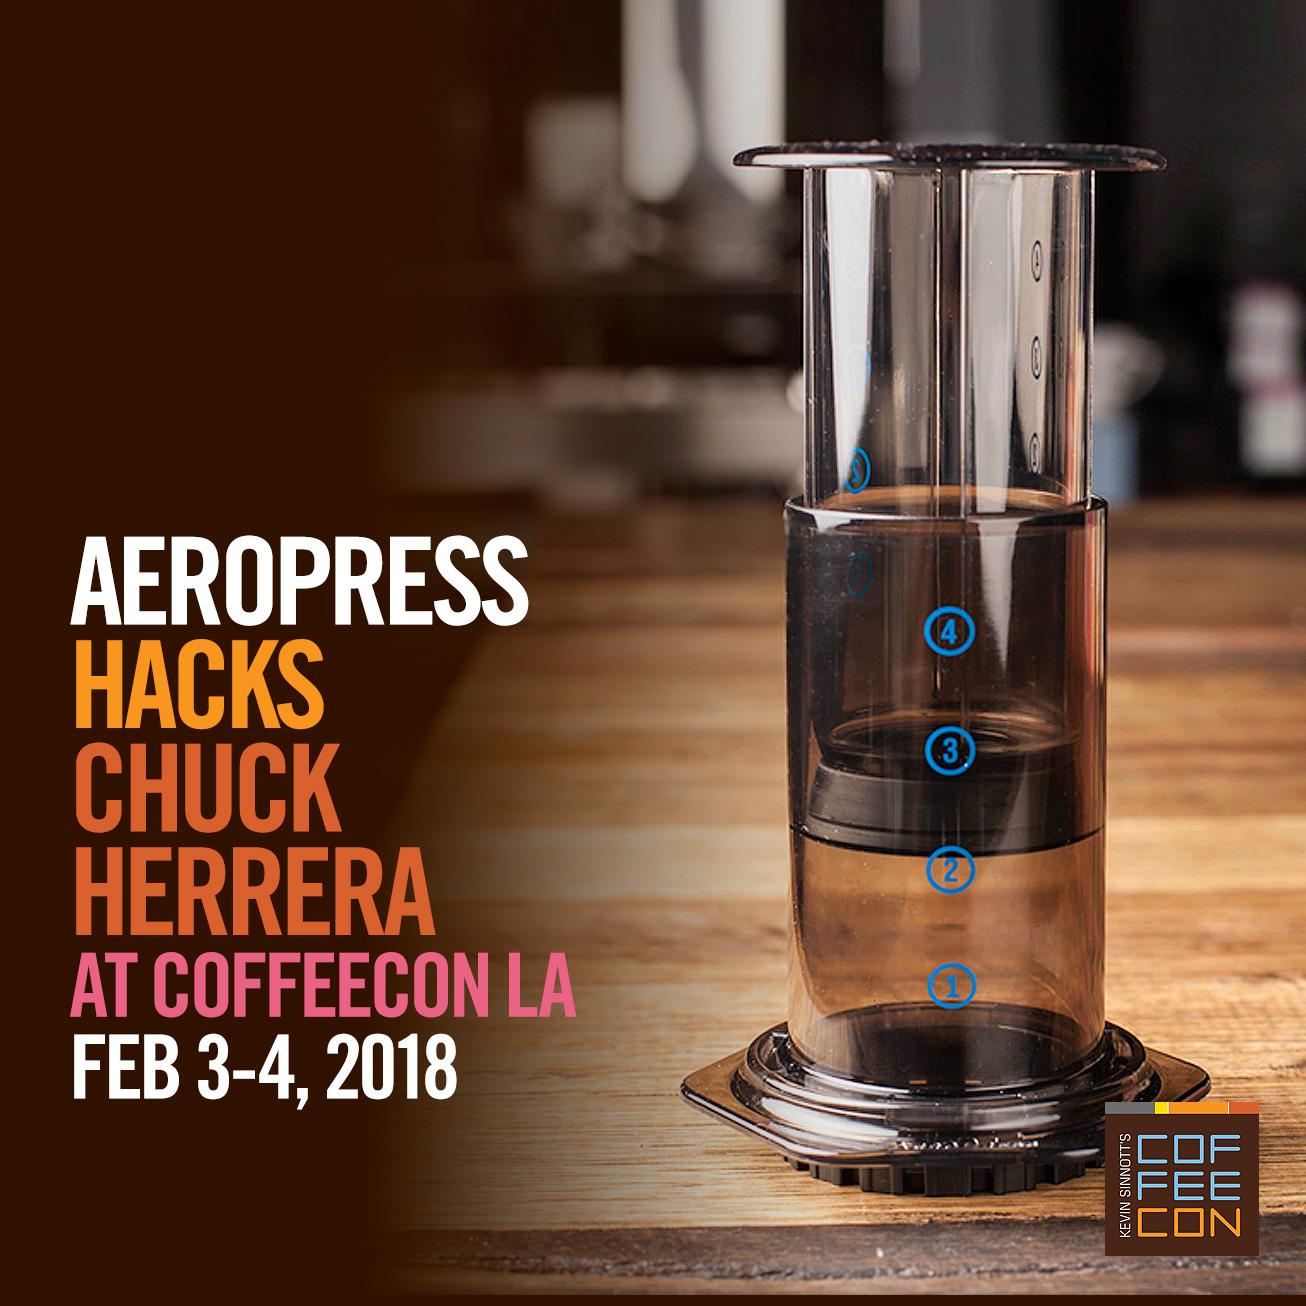 AeroPress Hacks at CoffeeConLA 2018